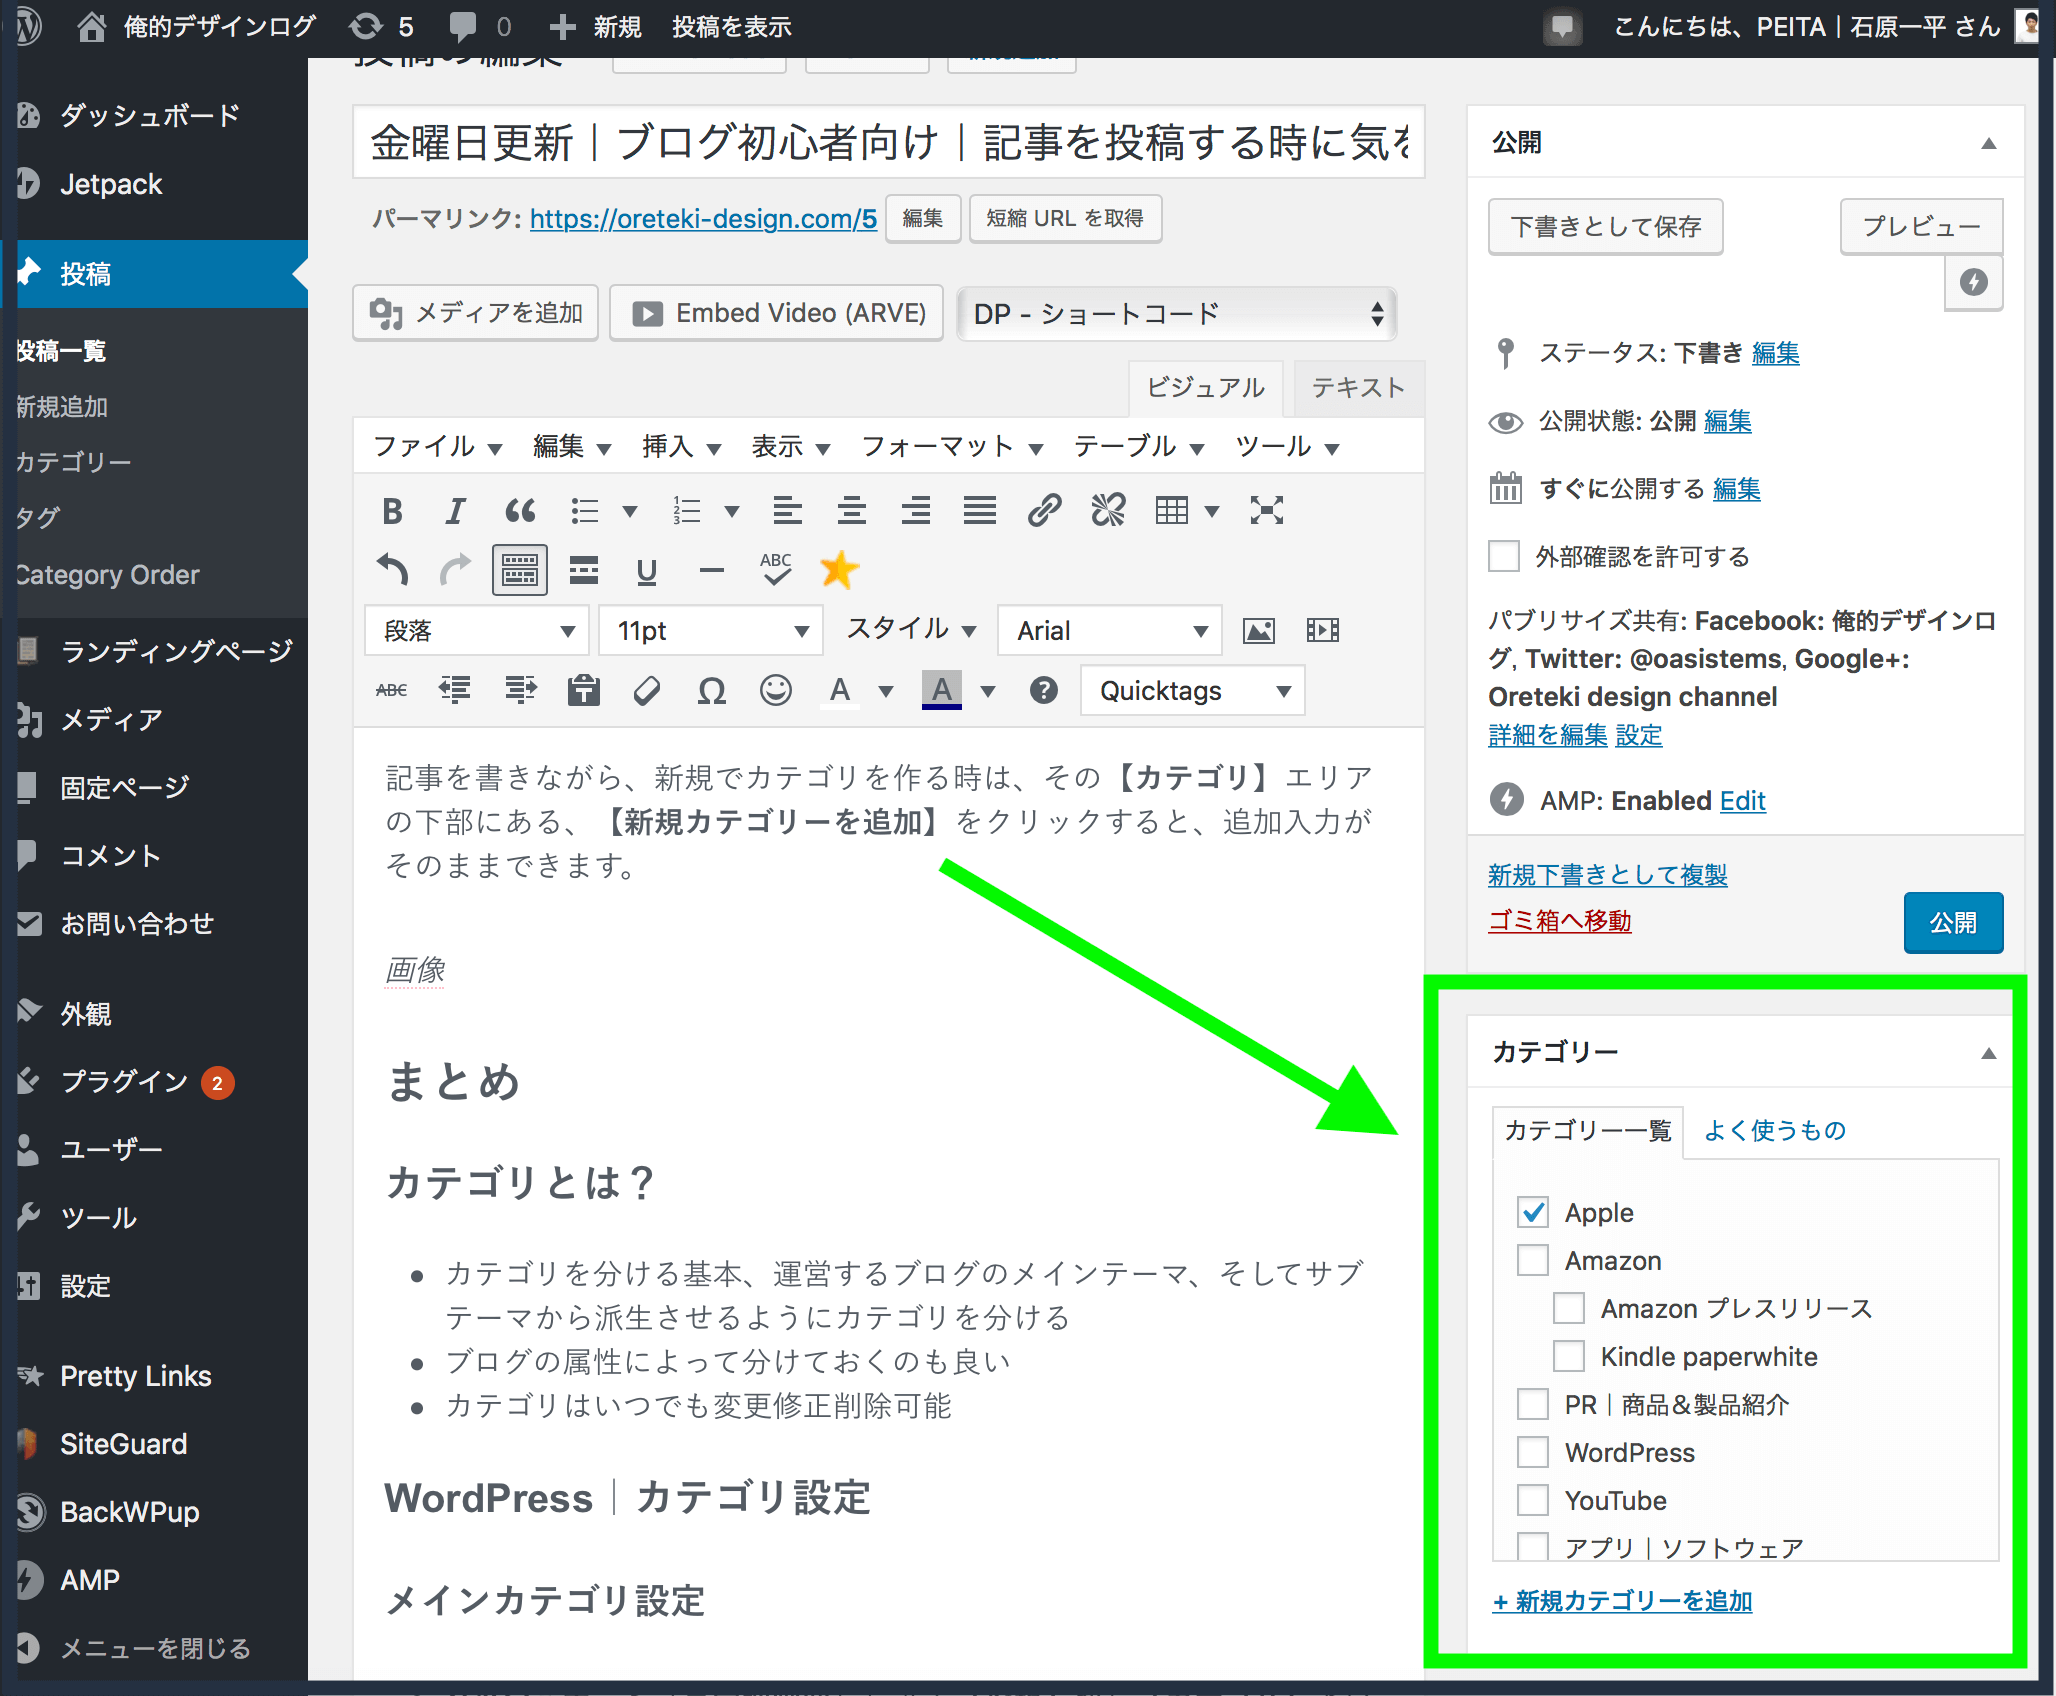 WordPressの記事投稿画面でカテゴリを設定している画層